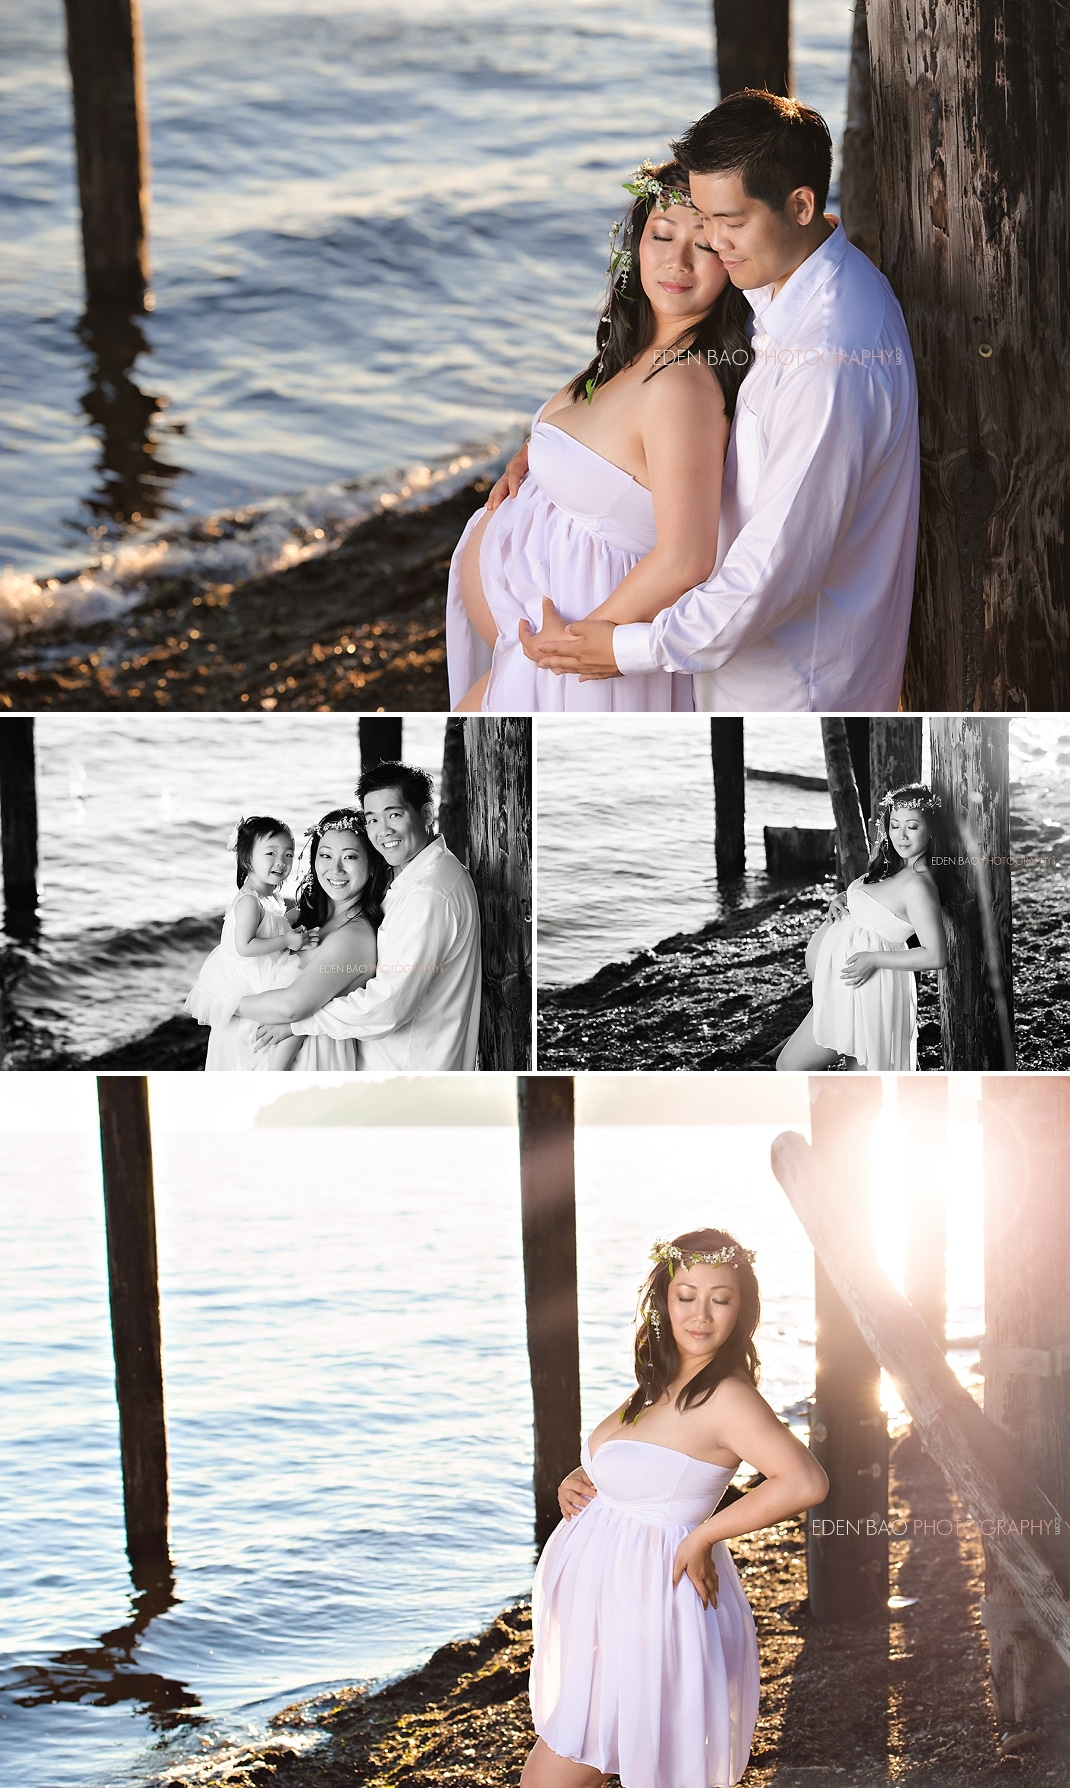 Vancouver BC Beach Maternity Photographer White Rock Crescent Beach Pier